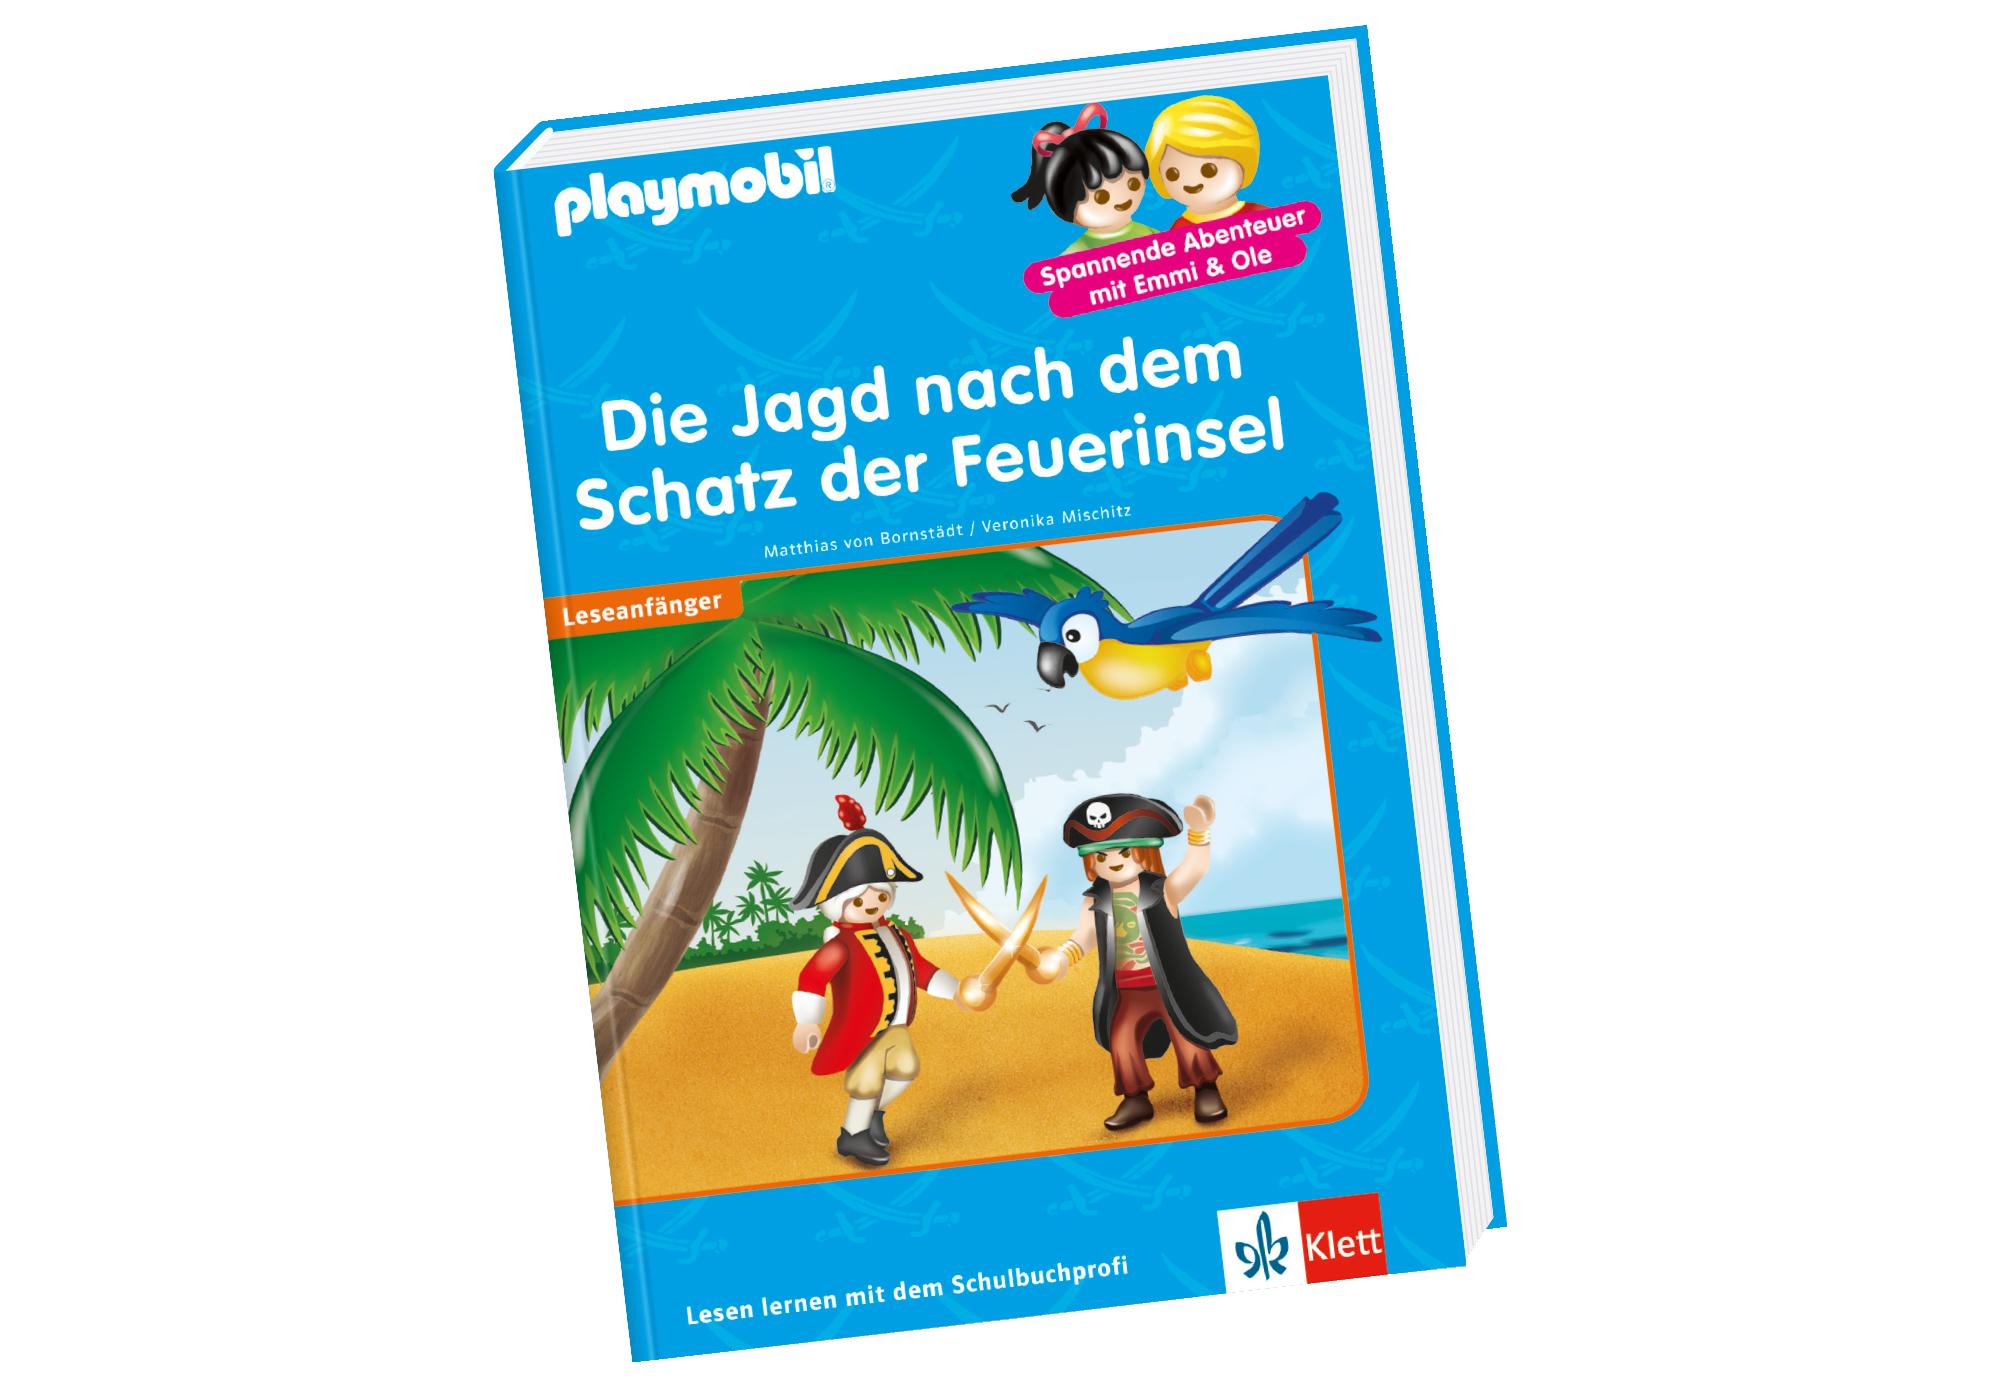 http://media.playmobil.com/i/playmobil/80700_product_detail